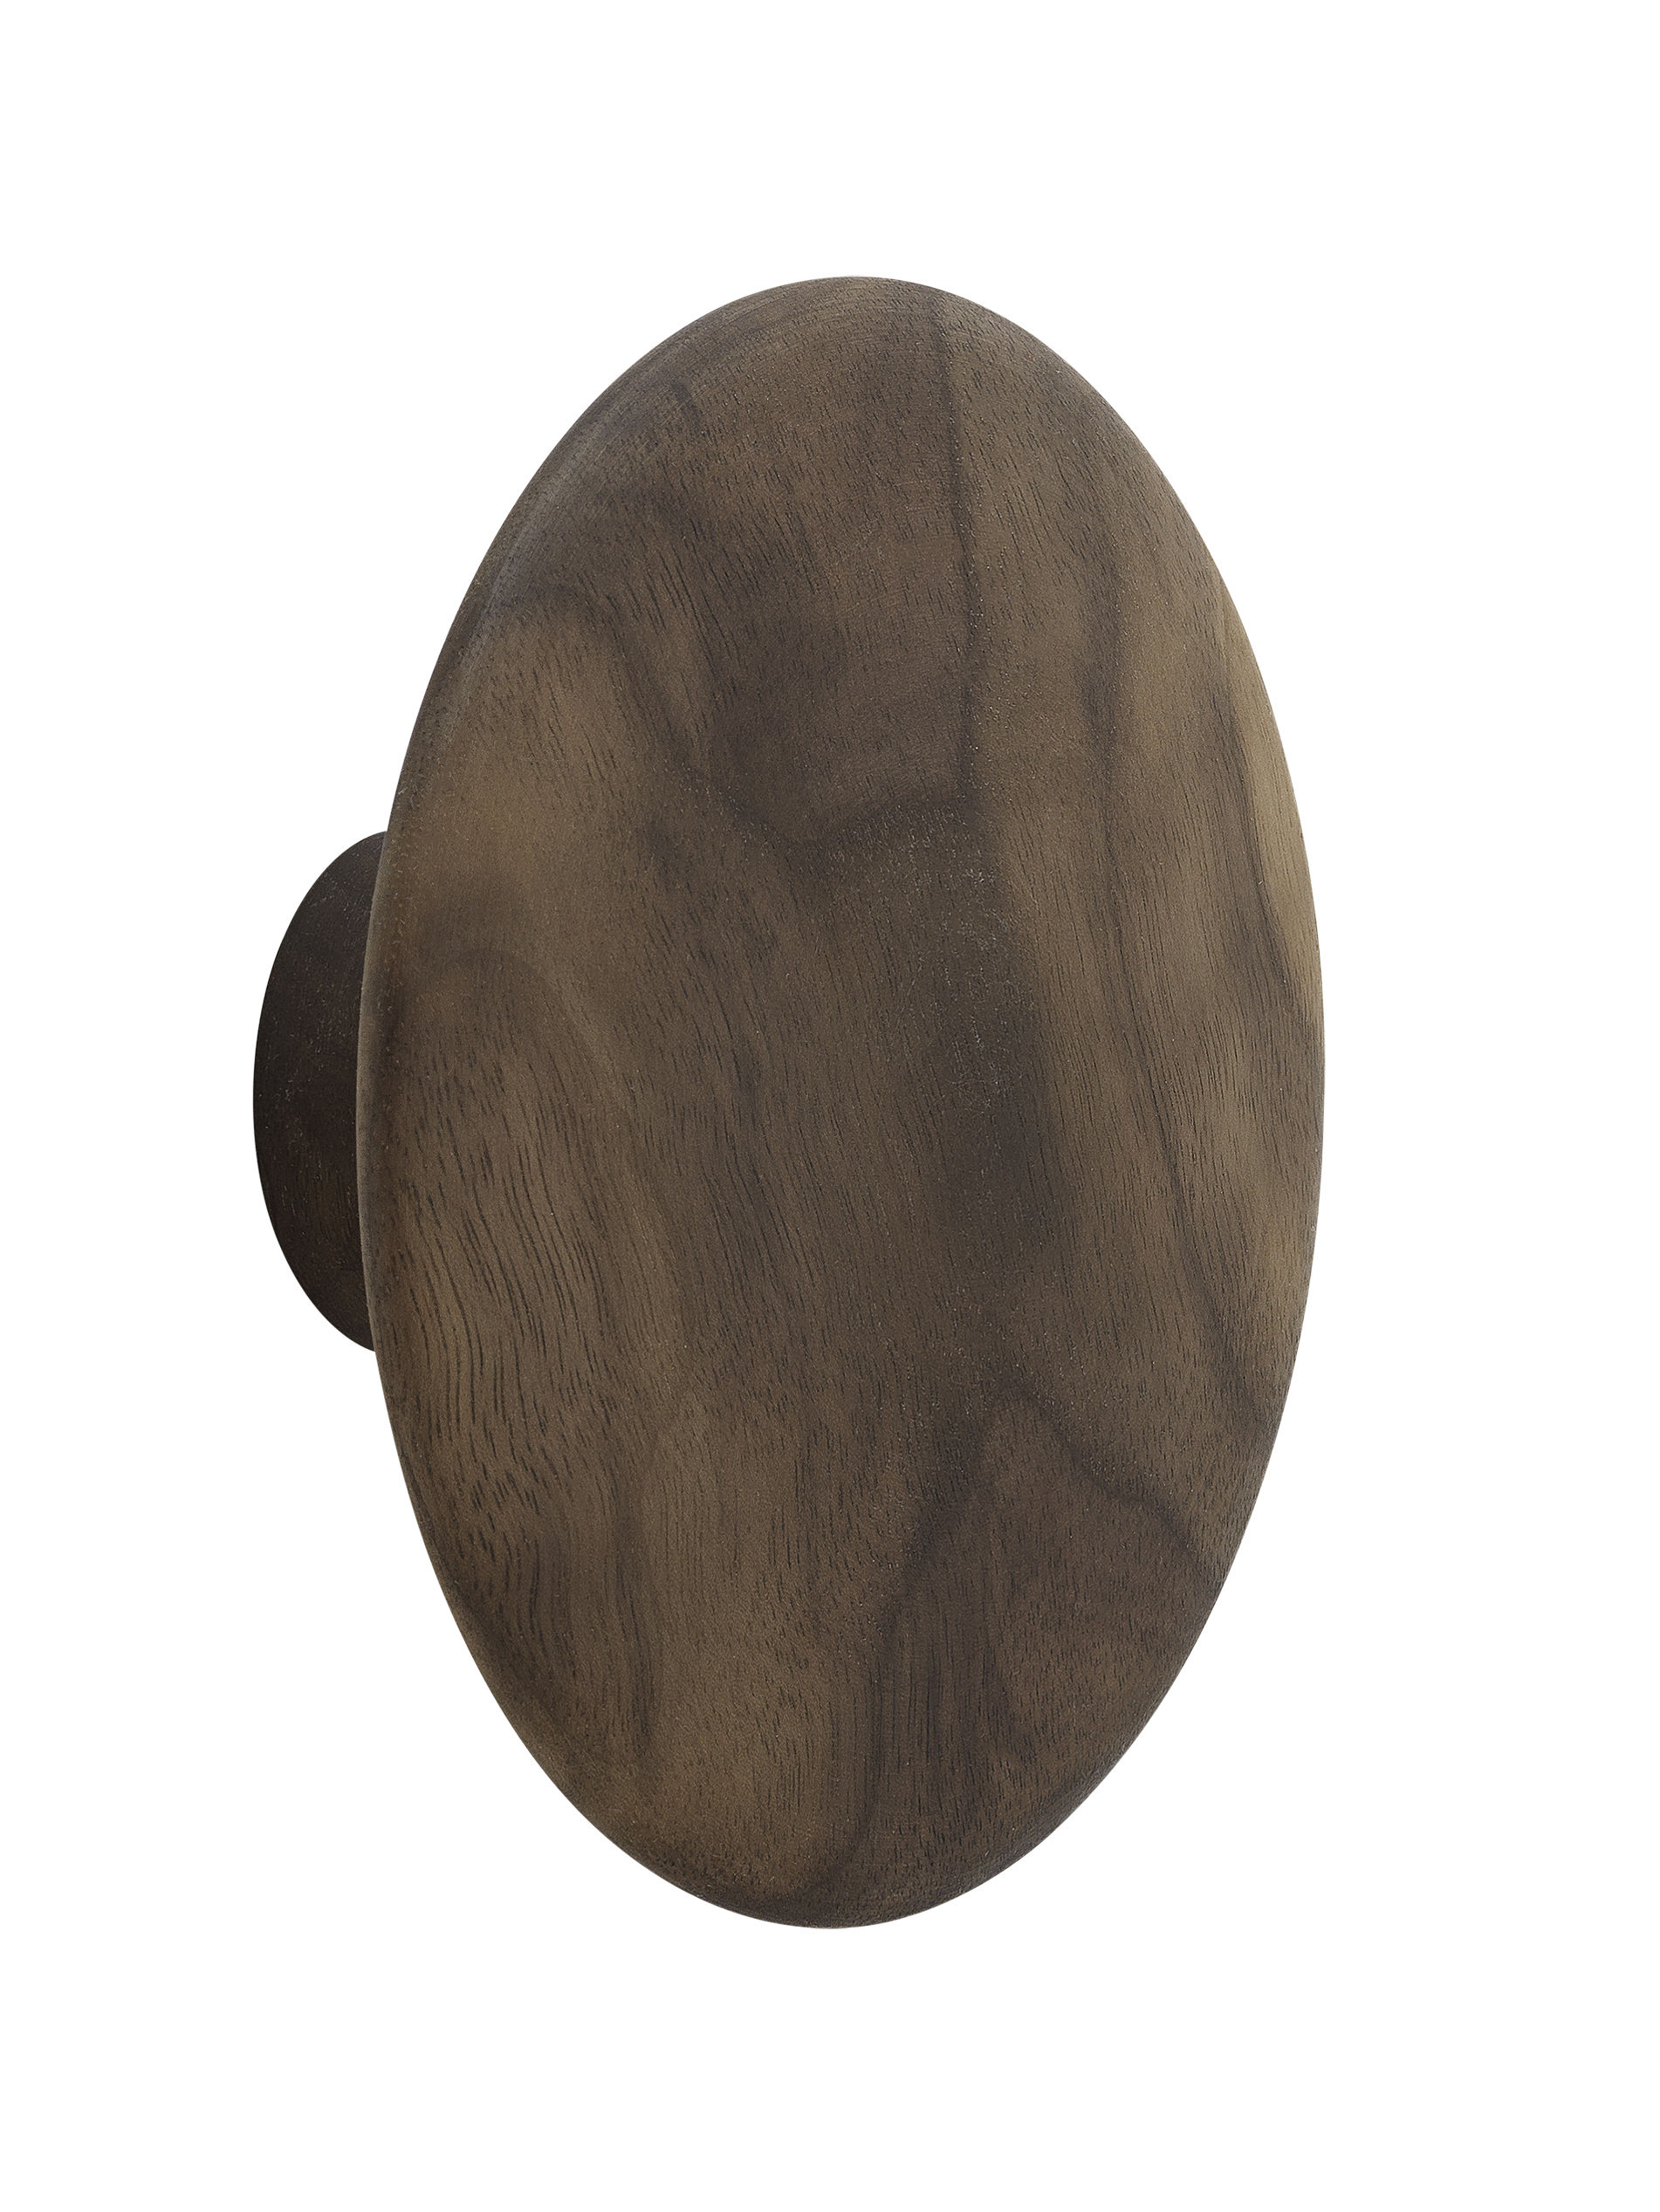 Interni - Rastrelliere e Ganci - Appendiabiti The Dots Wood - / Medium - Ø 13 cm di Muuto - Noce naturale - Noyer naturel